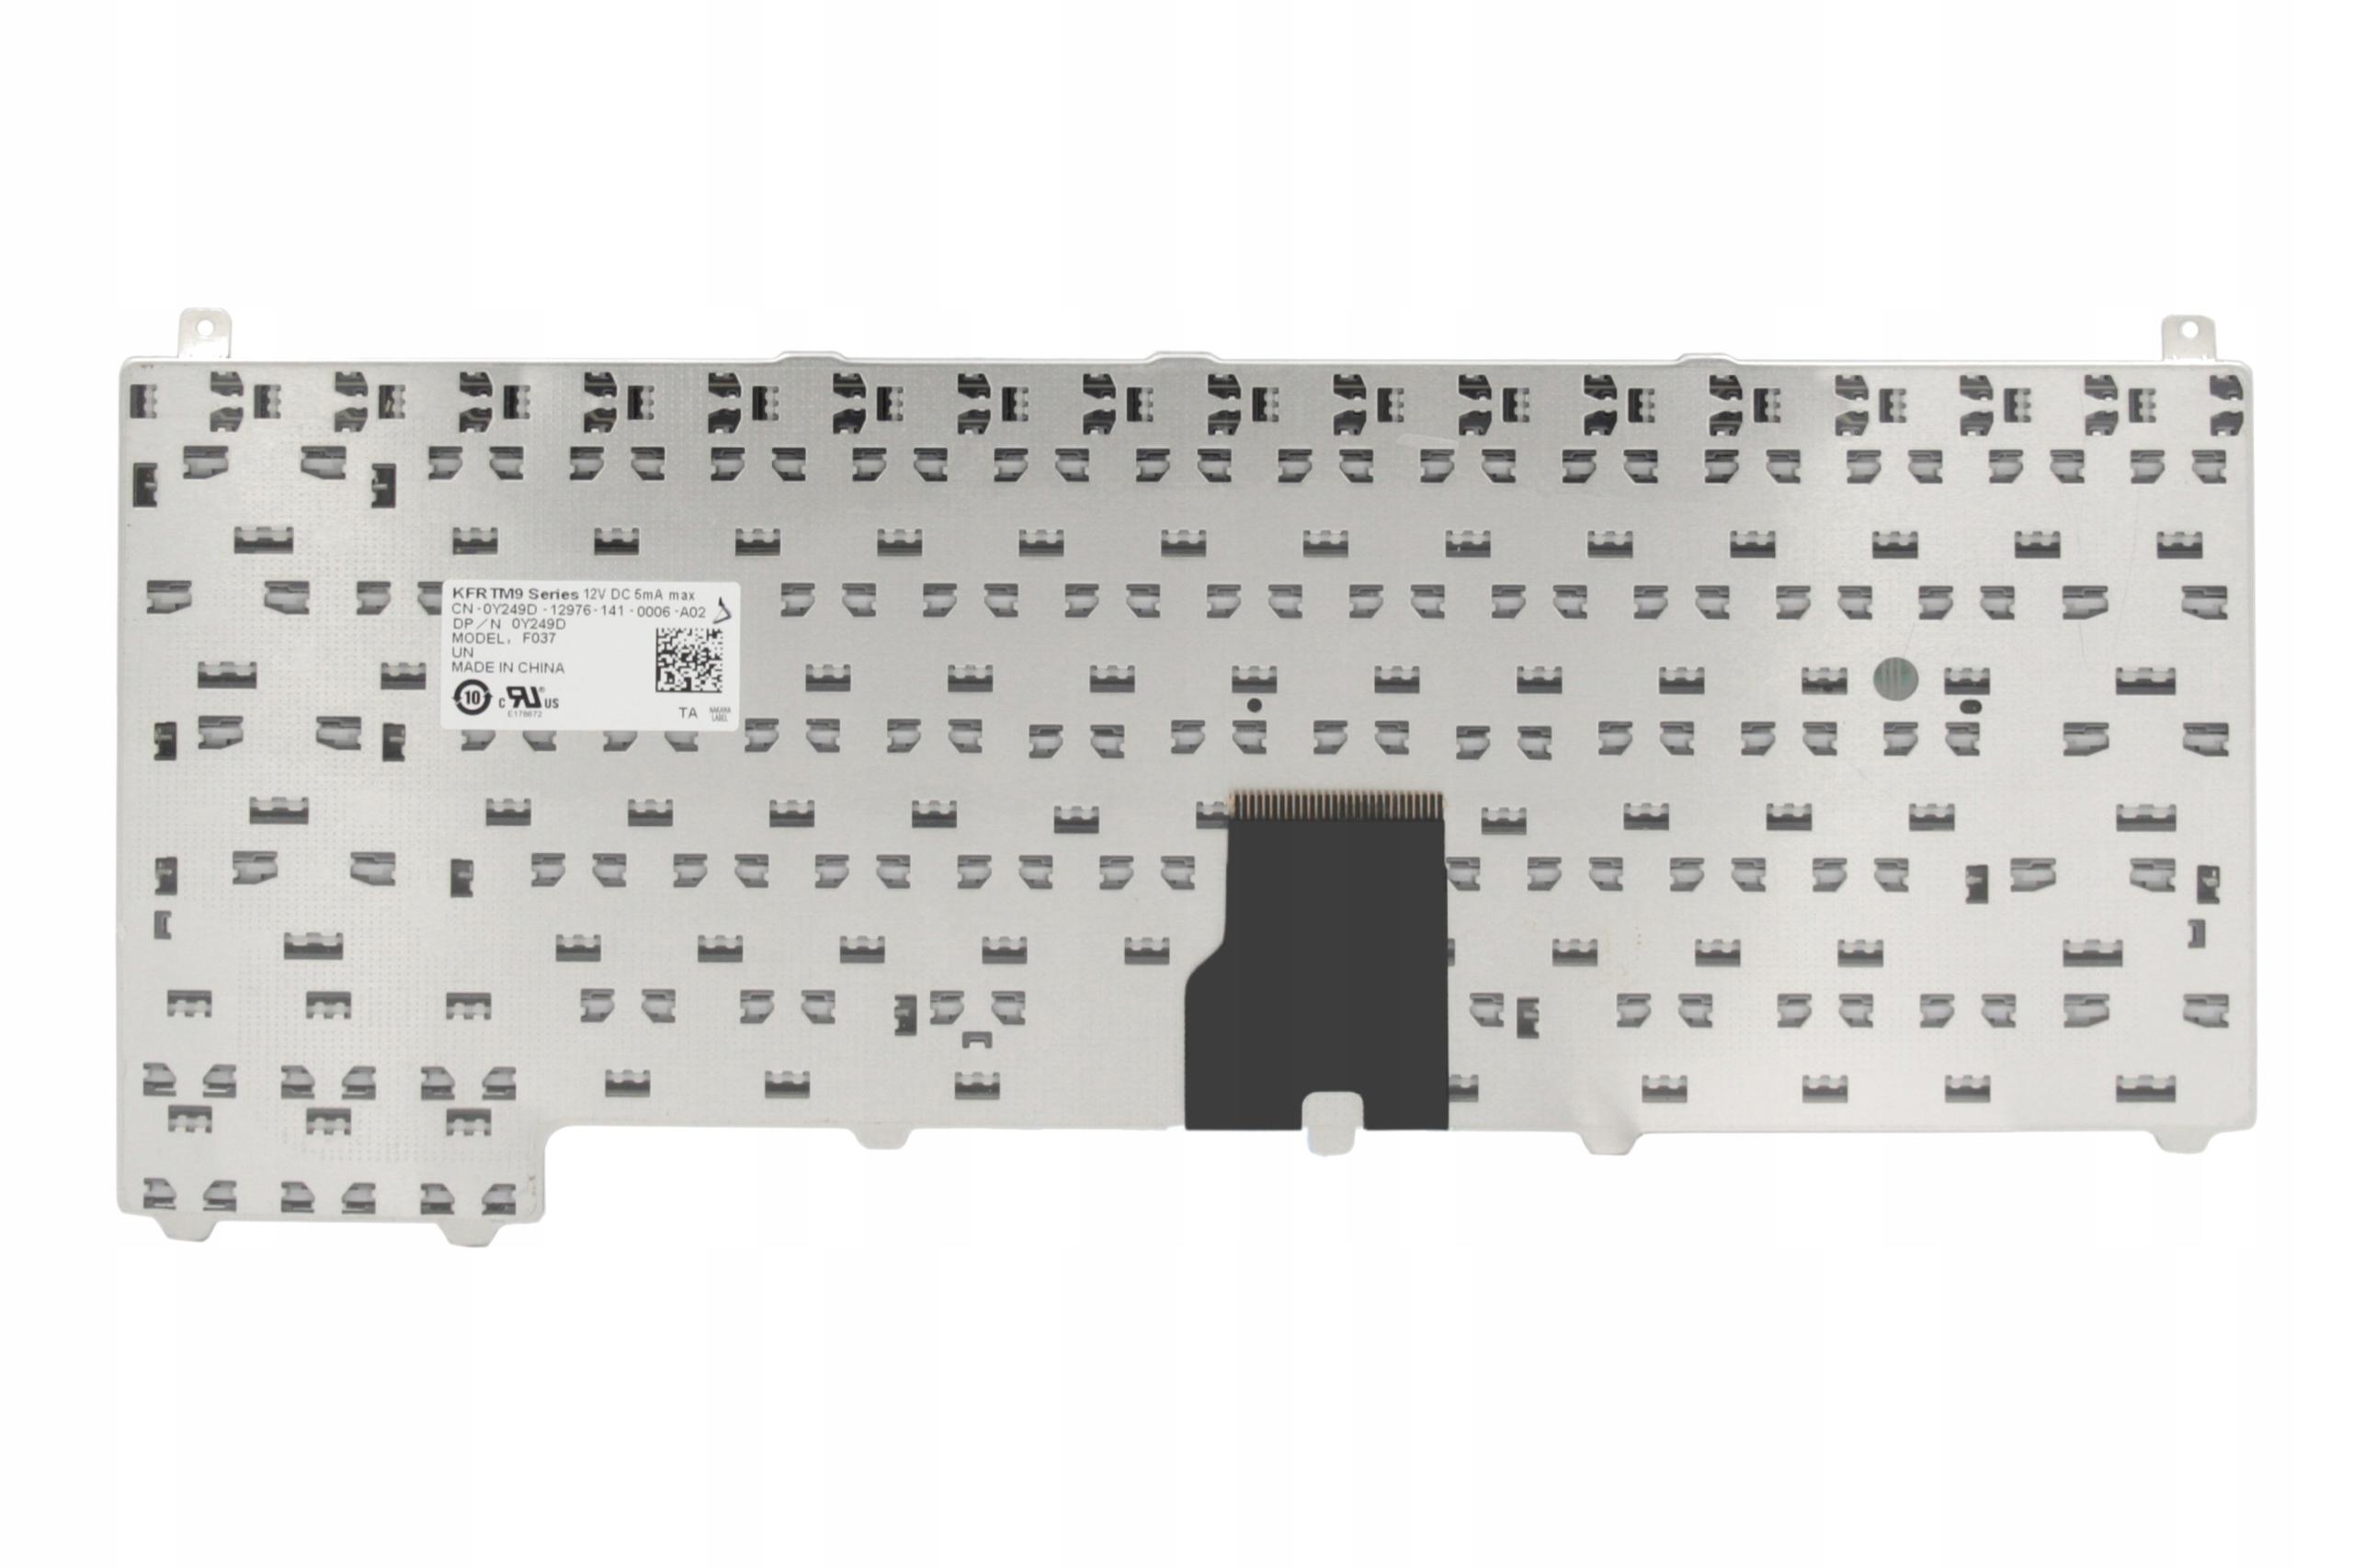 KLAWIATURA DELL E4200 - Klawiatury do laptopów